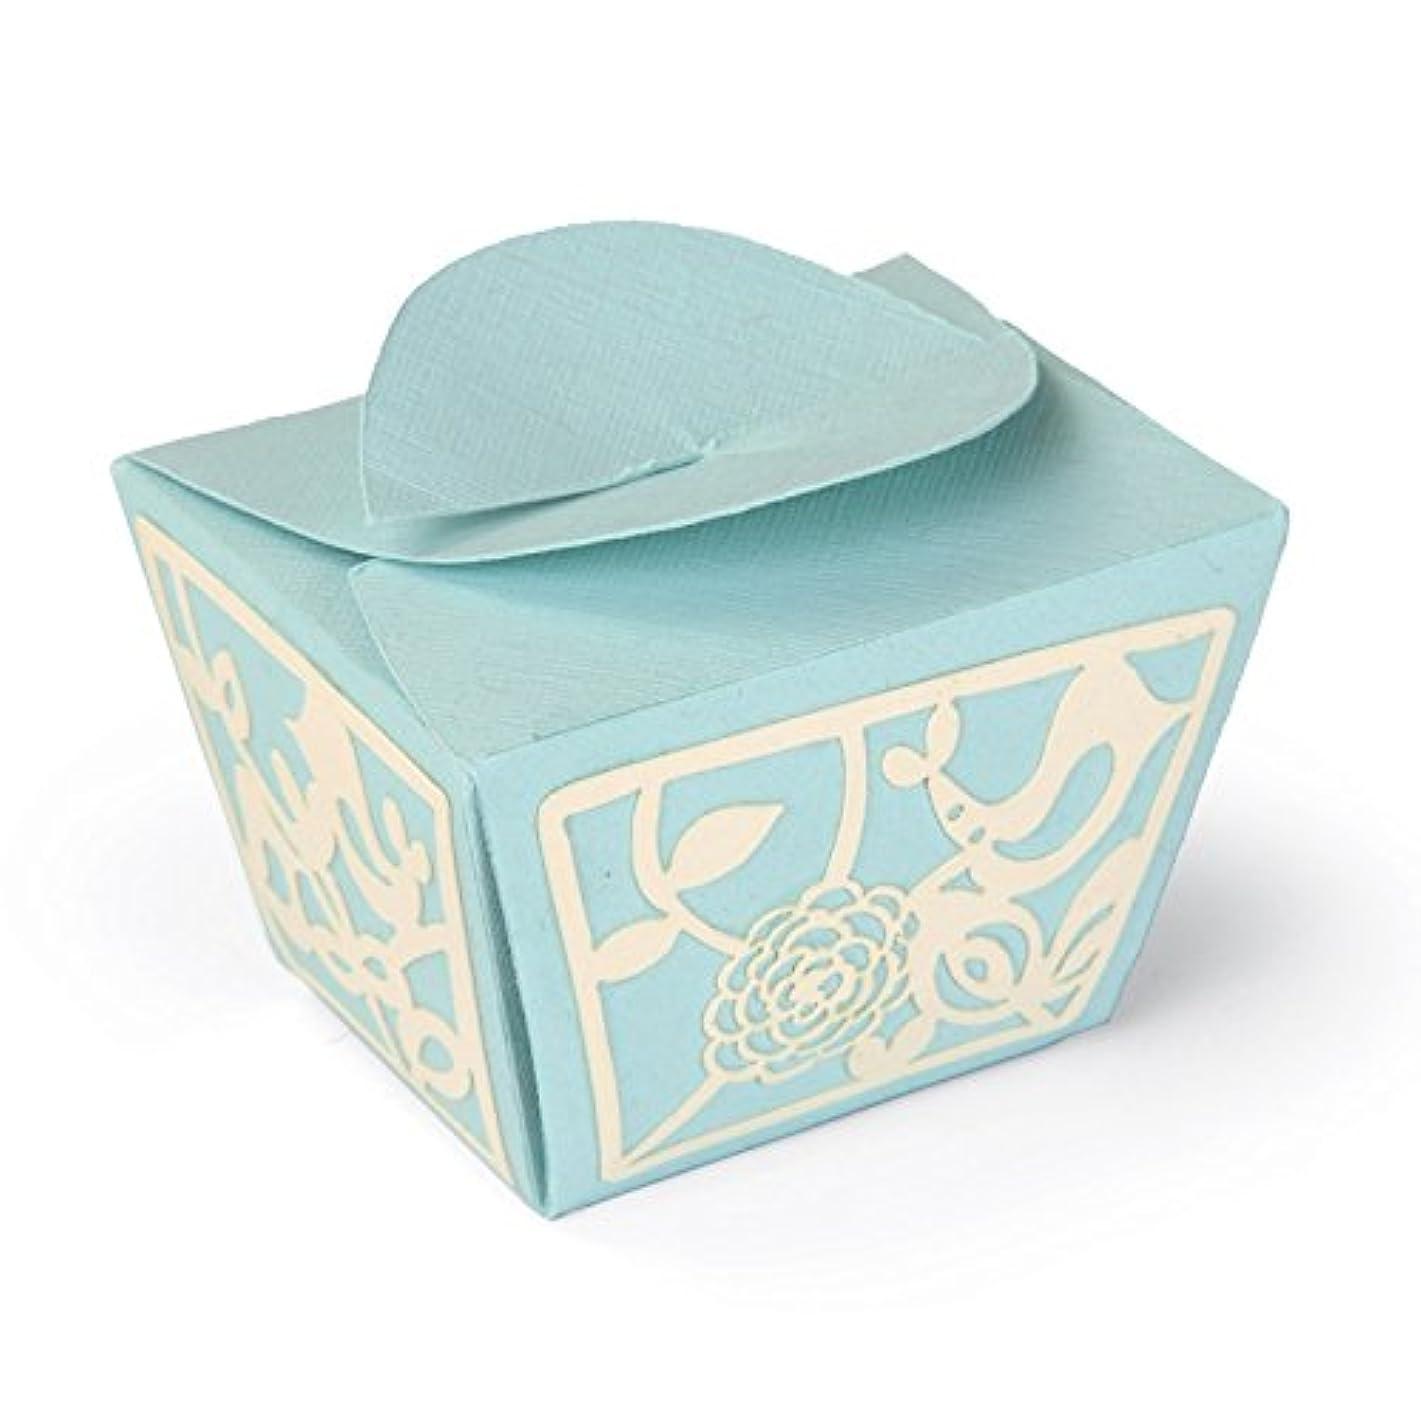 Sizzix Thinlits Plus Die Set 3PK-Love Birds Gift Box by Emily Atherton